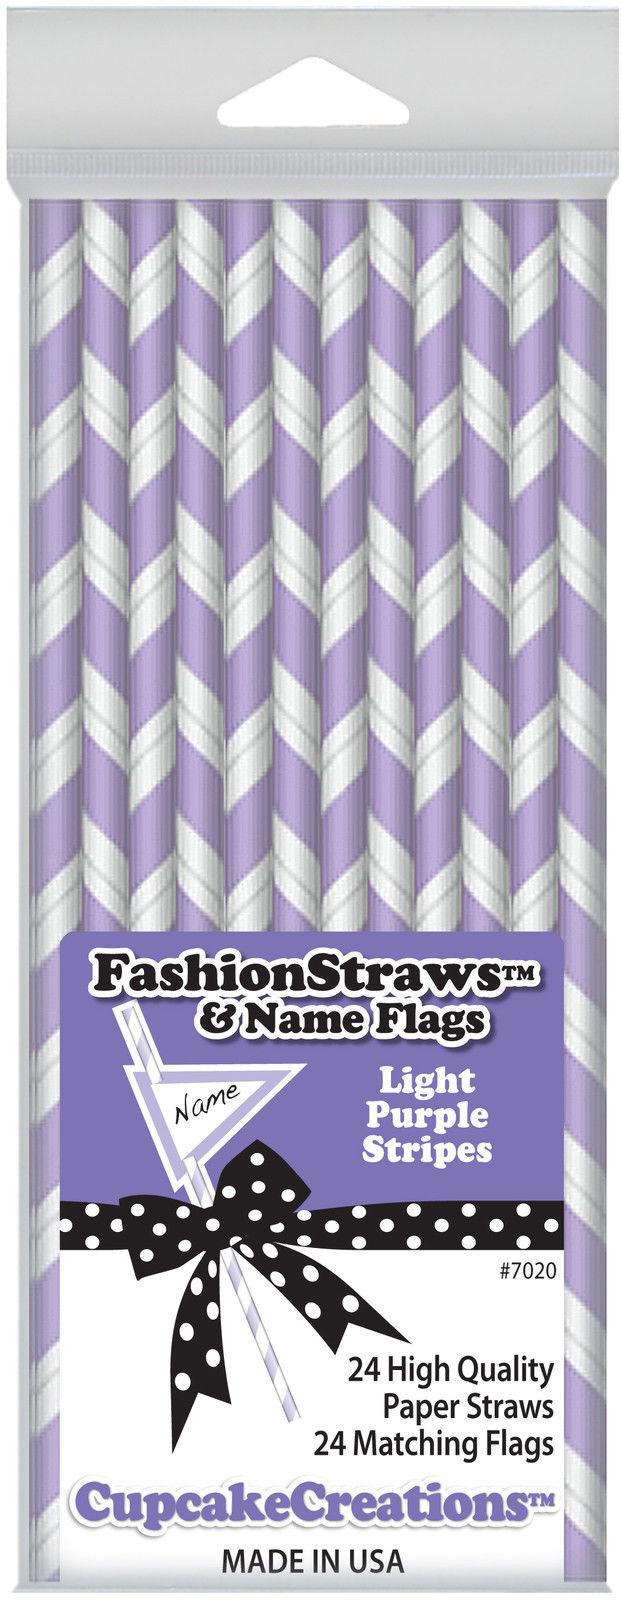 Cupcake Creations 24 Pk 7025 Yellow Stripes Fashion Straws /& Name Flags